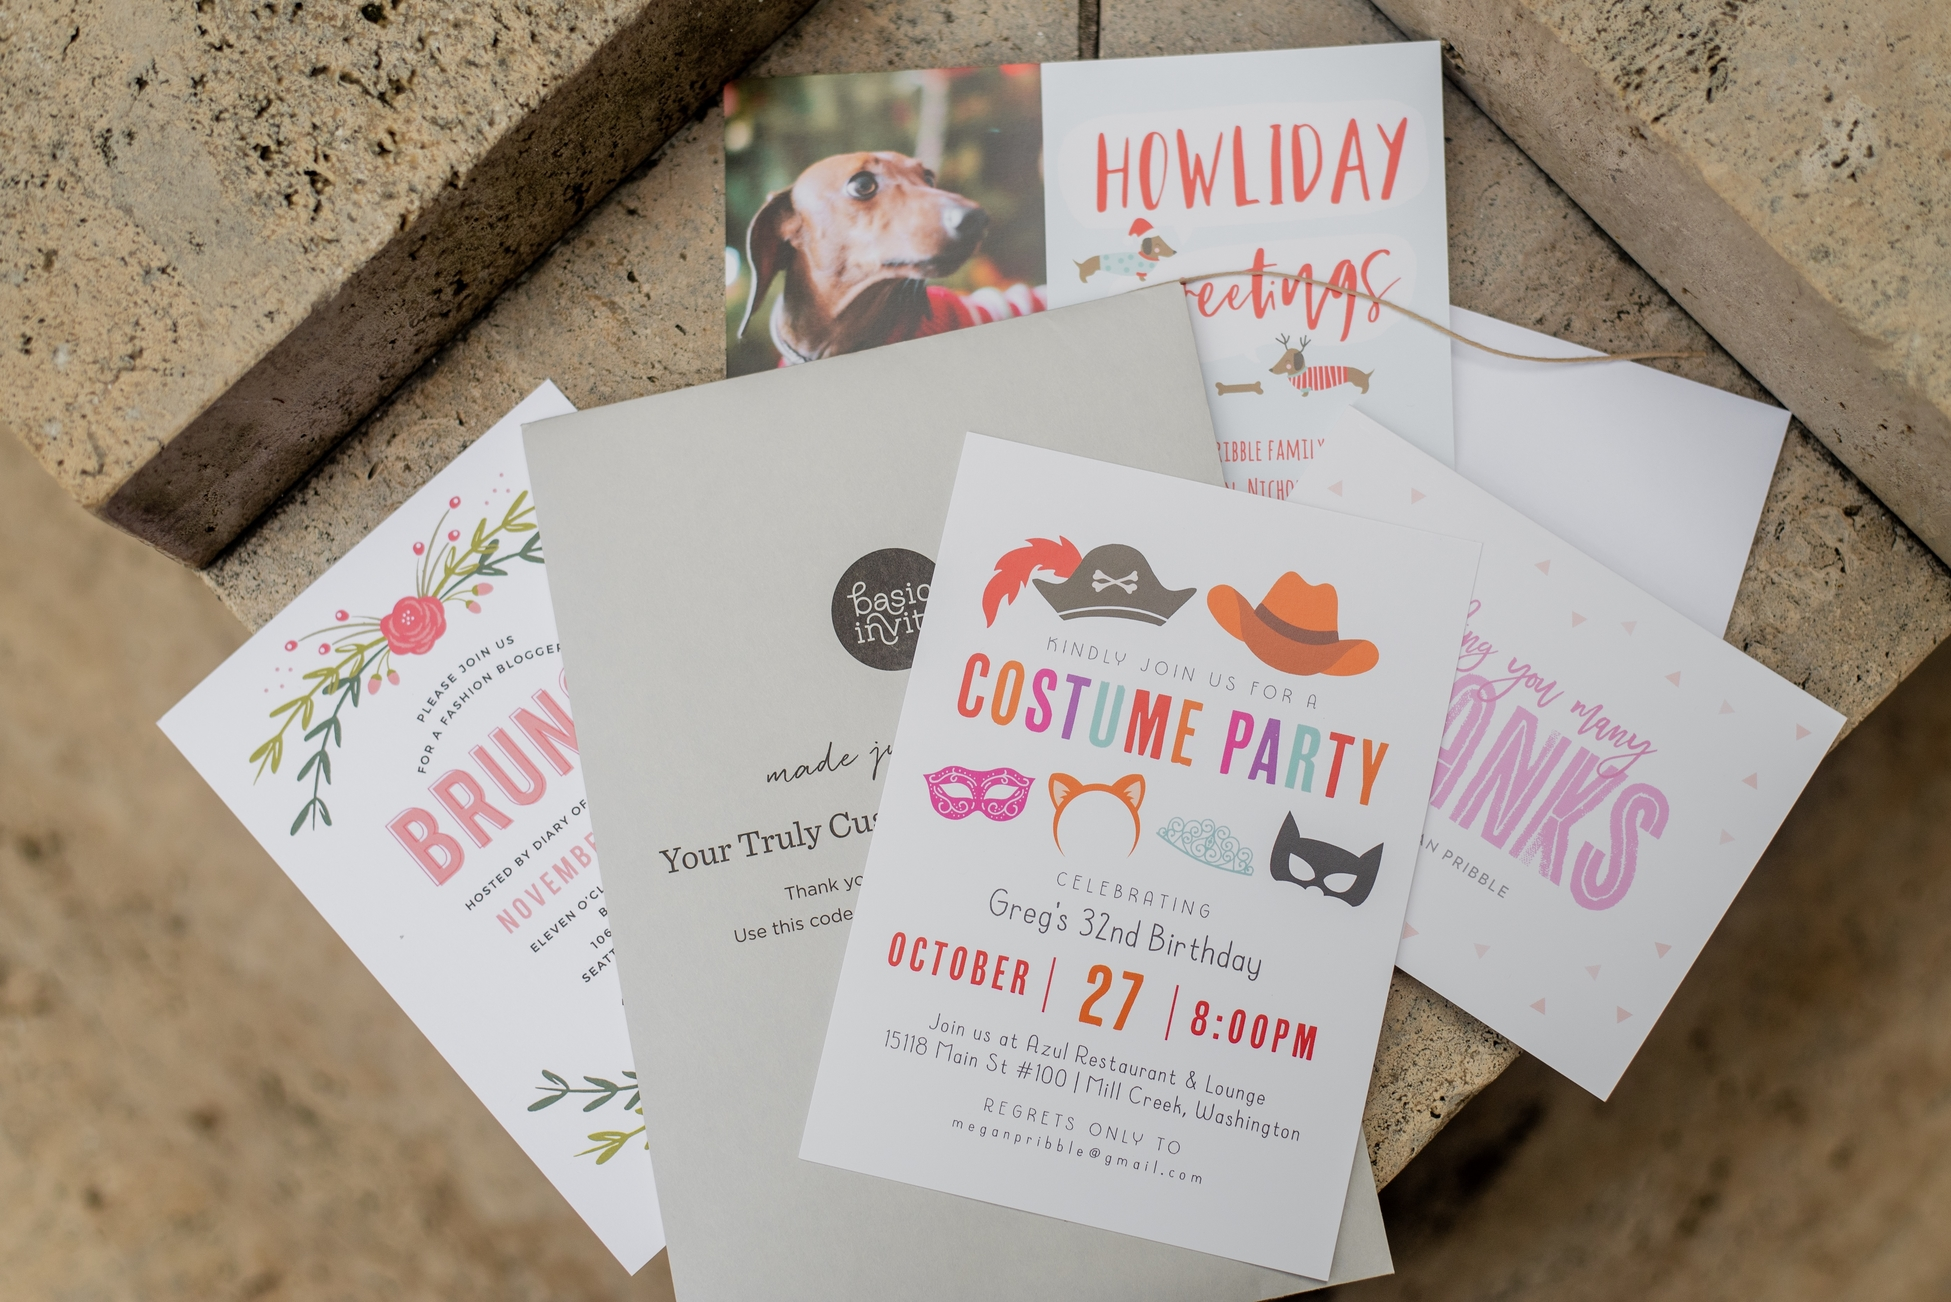 basic invite, greeting cards